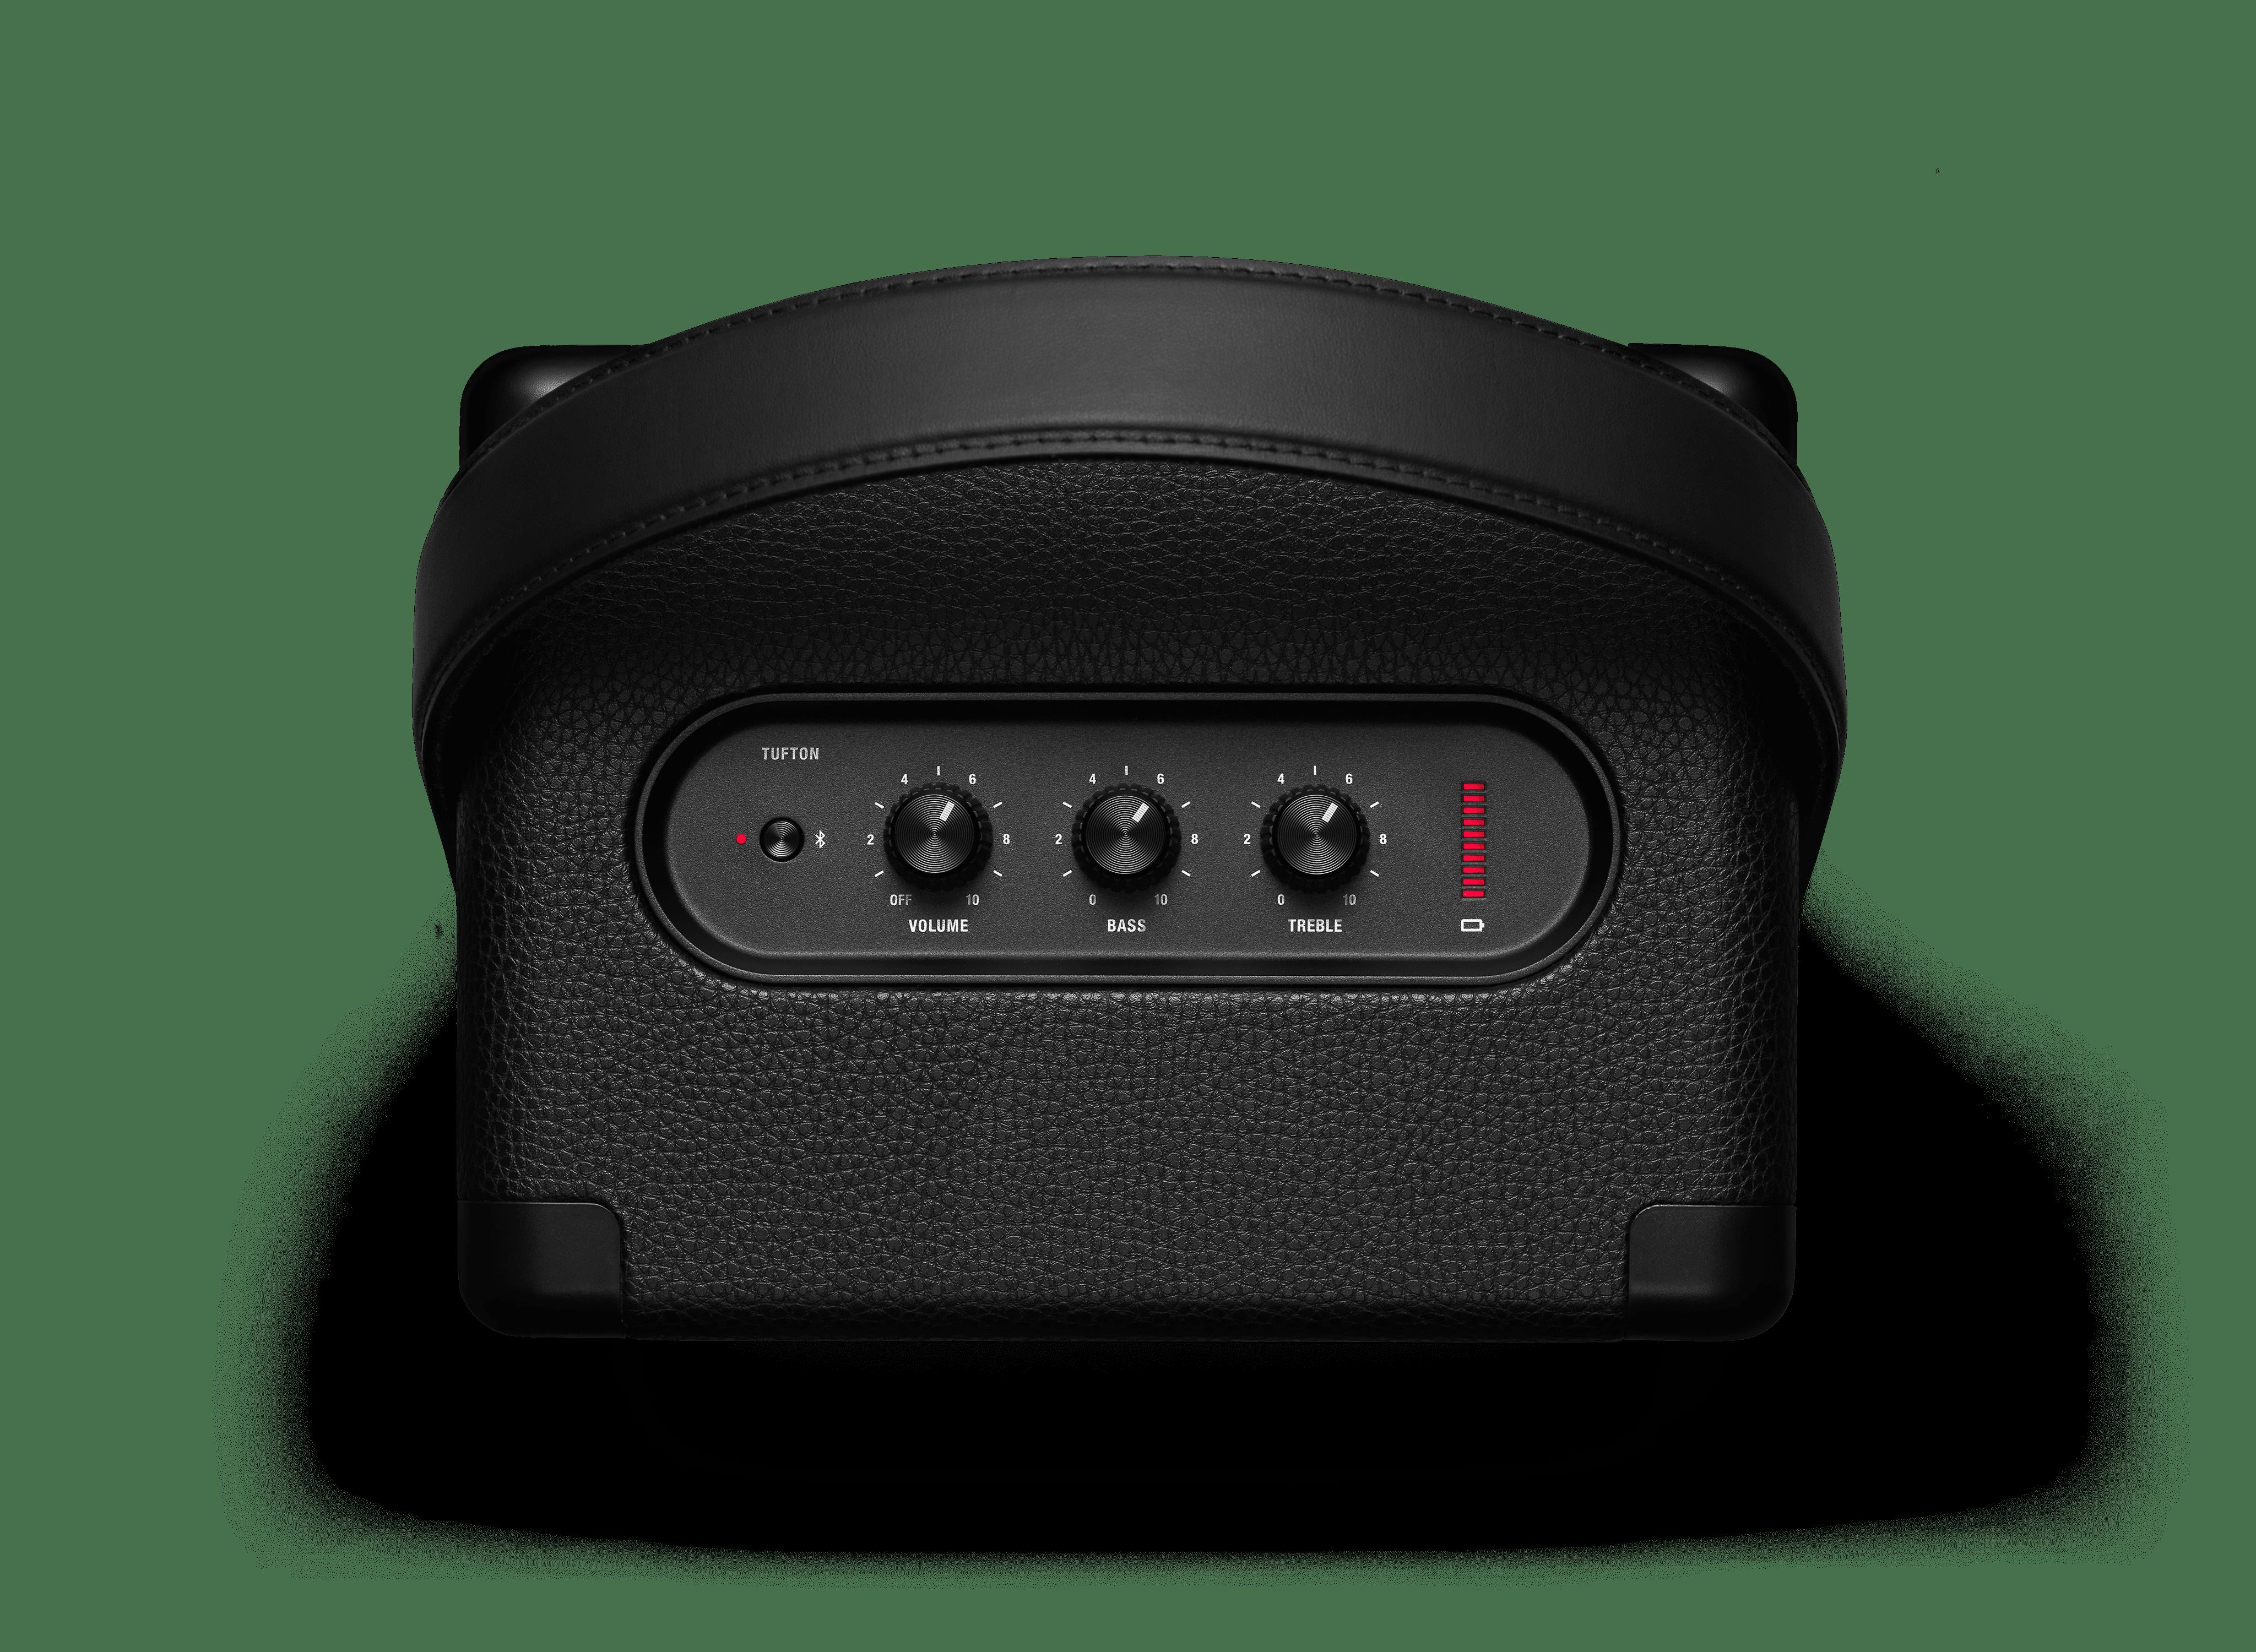 Buy Marshall Tufton Portable Speaker | Marshall